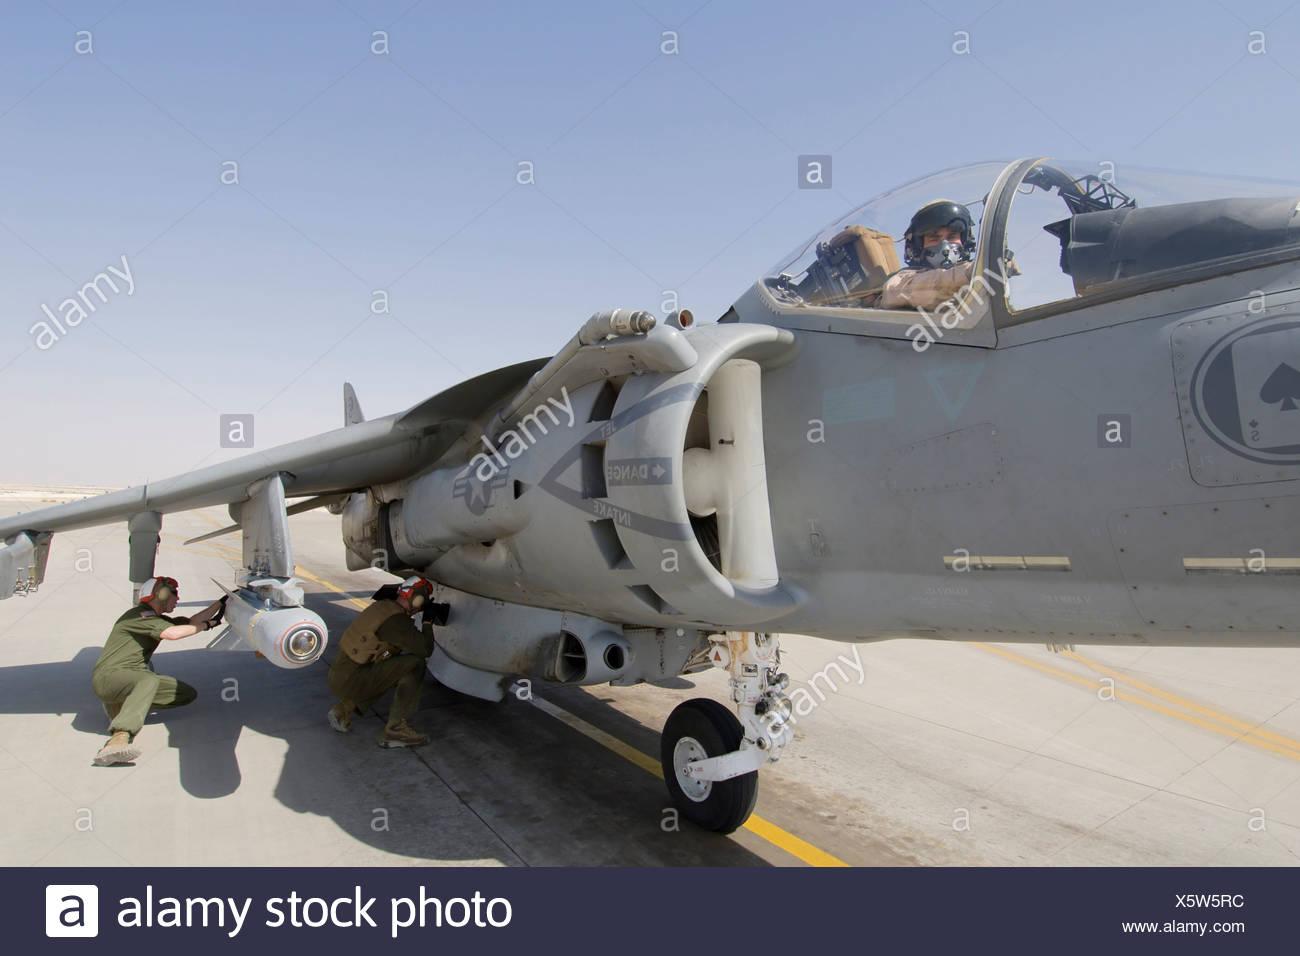 A US Marine Arms Laser Maverick Air Ground Missile Mounted on AV-8B Harrier Ready Launch Al Asad Air Base in Iraq's Al Anbar - Stock Image